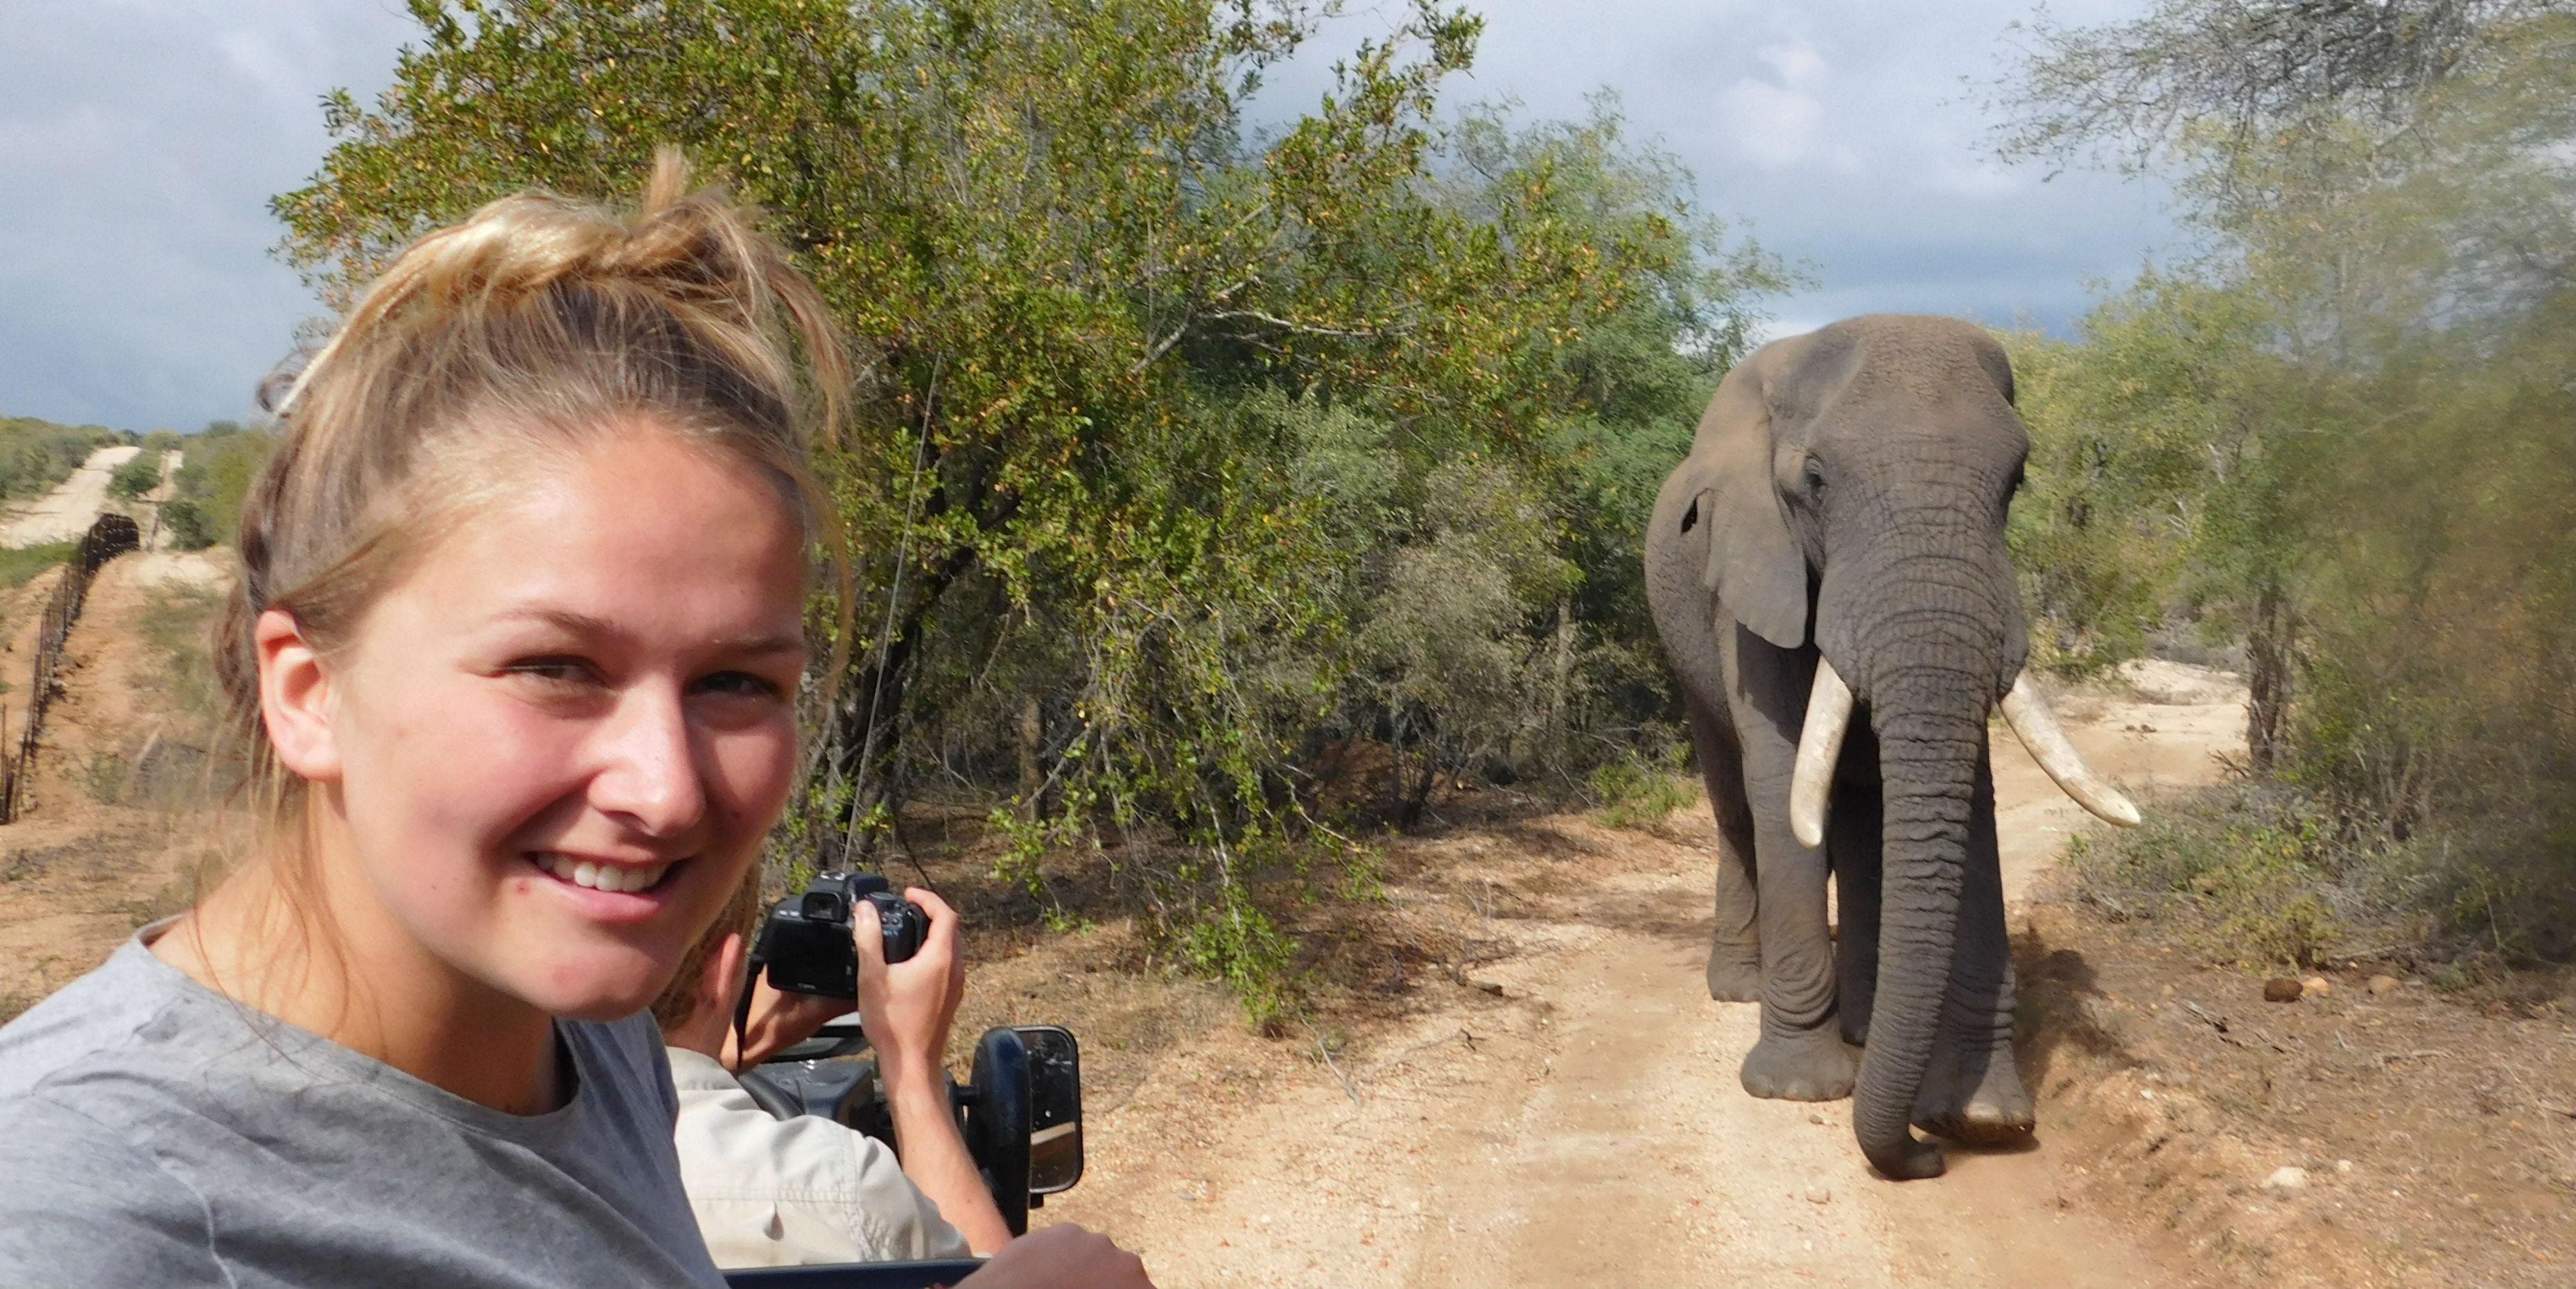 volunteer with animals in africa